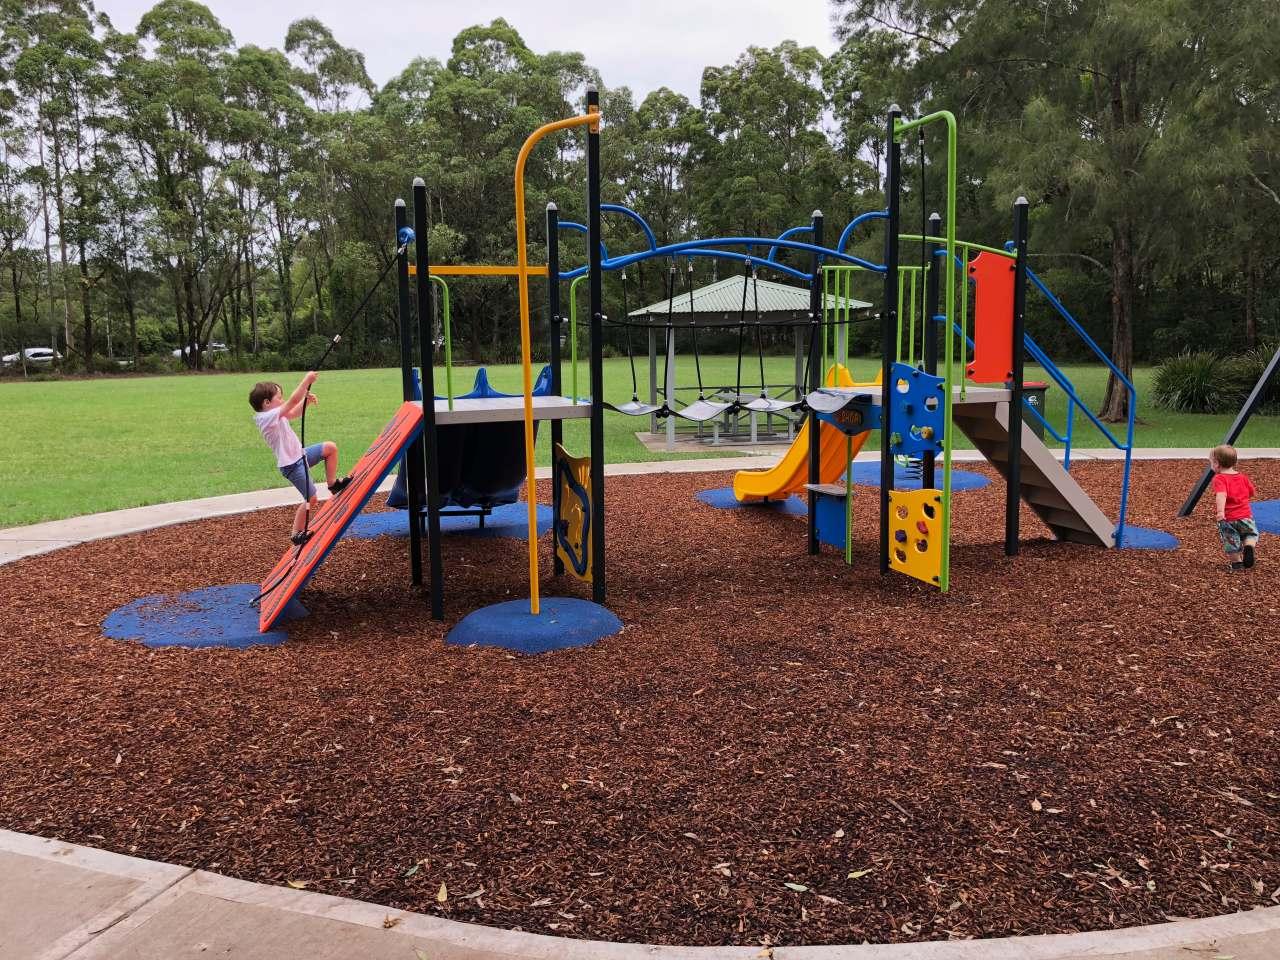 Enjoy this quiet playground at Cutrock Park, Ourimbah